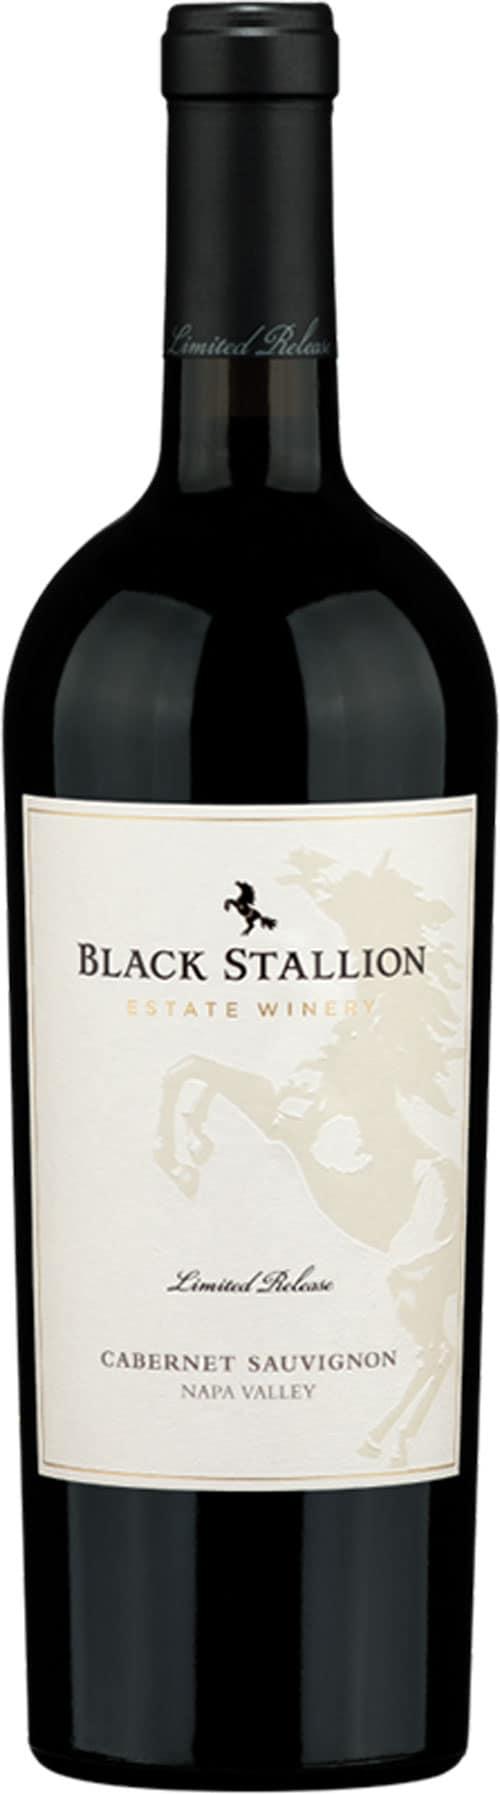 The Black Stallion limited release bottle.